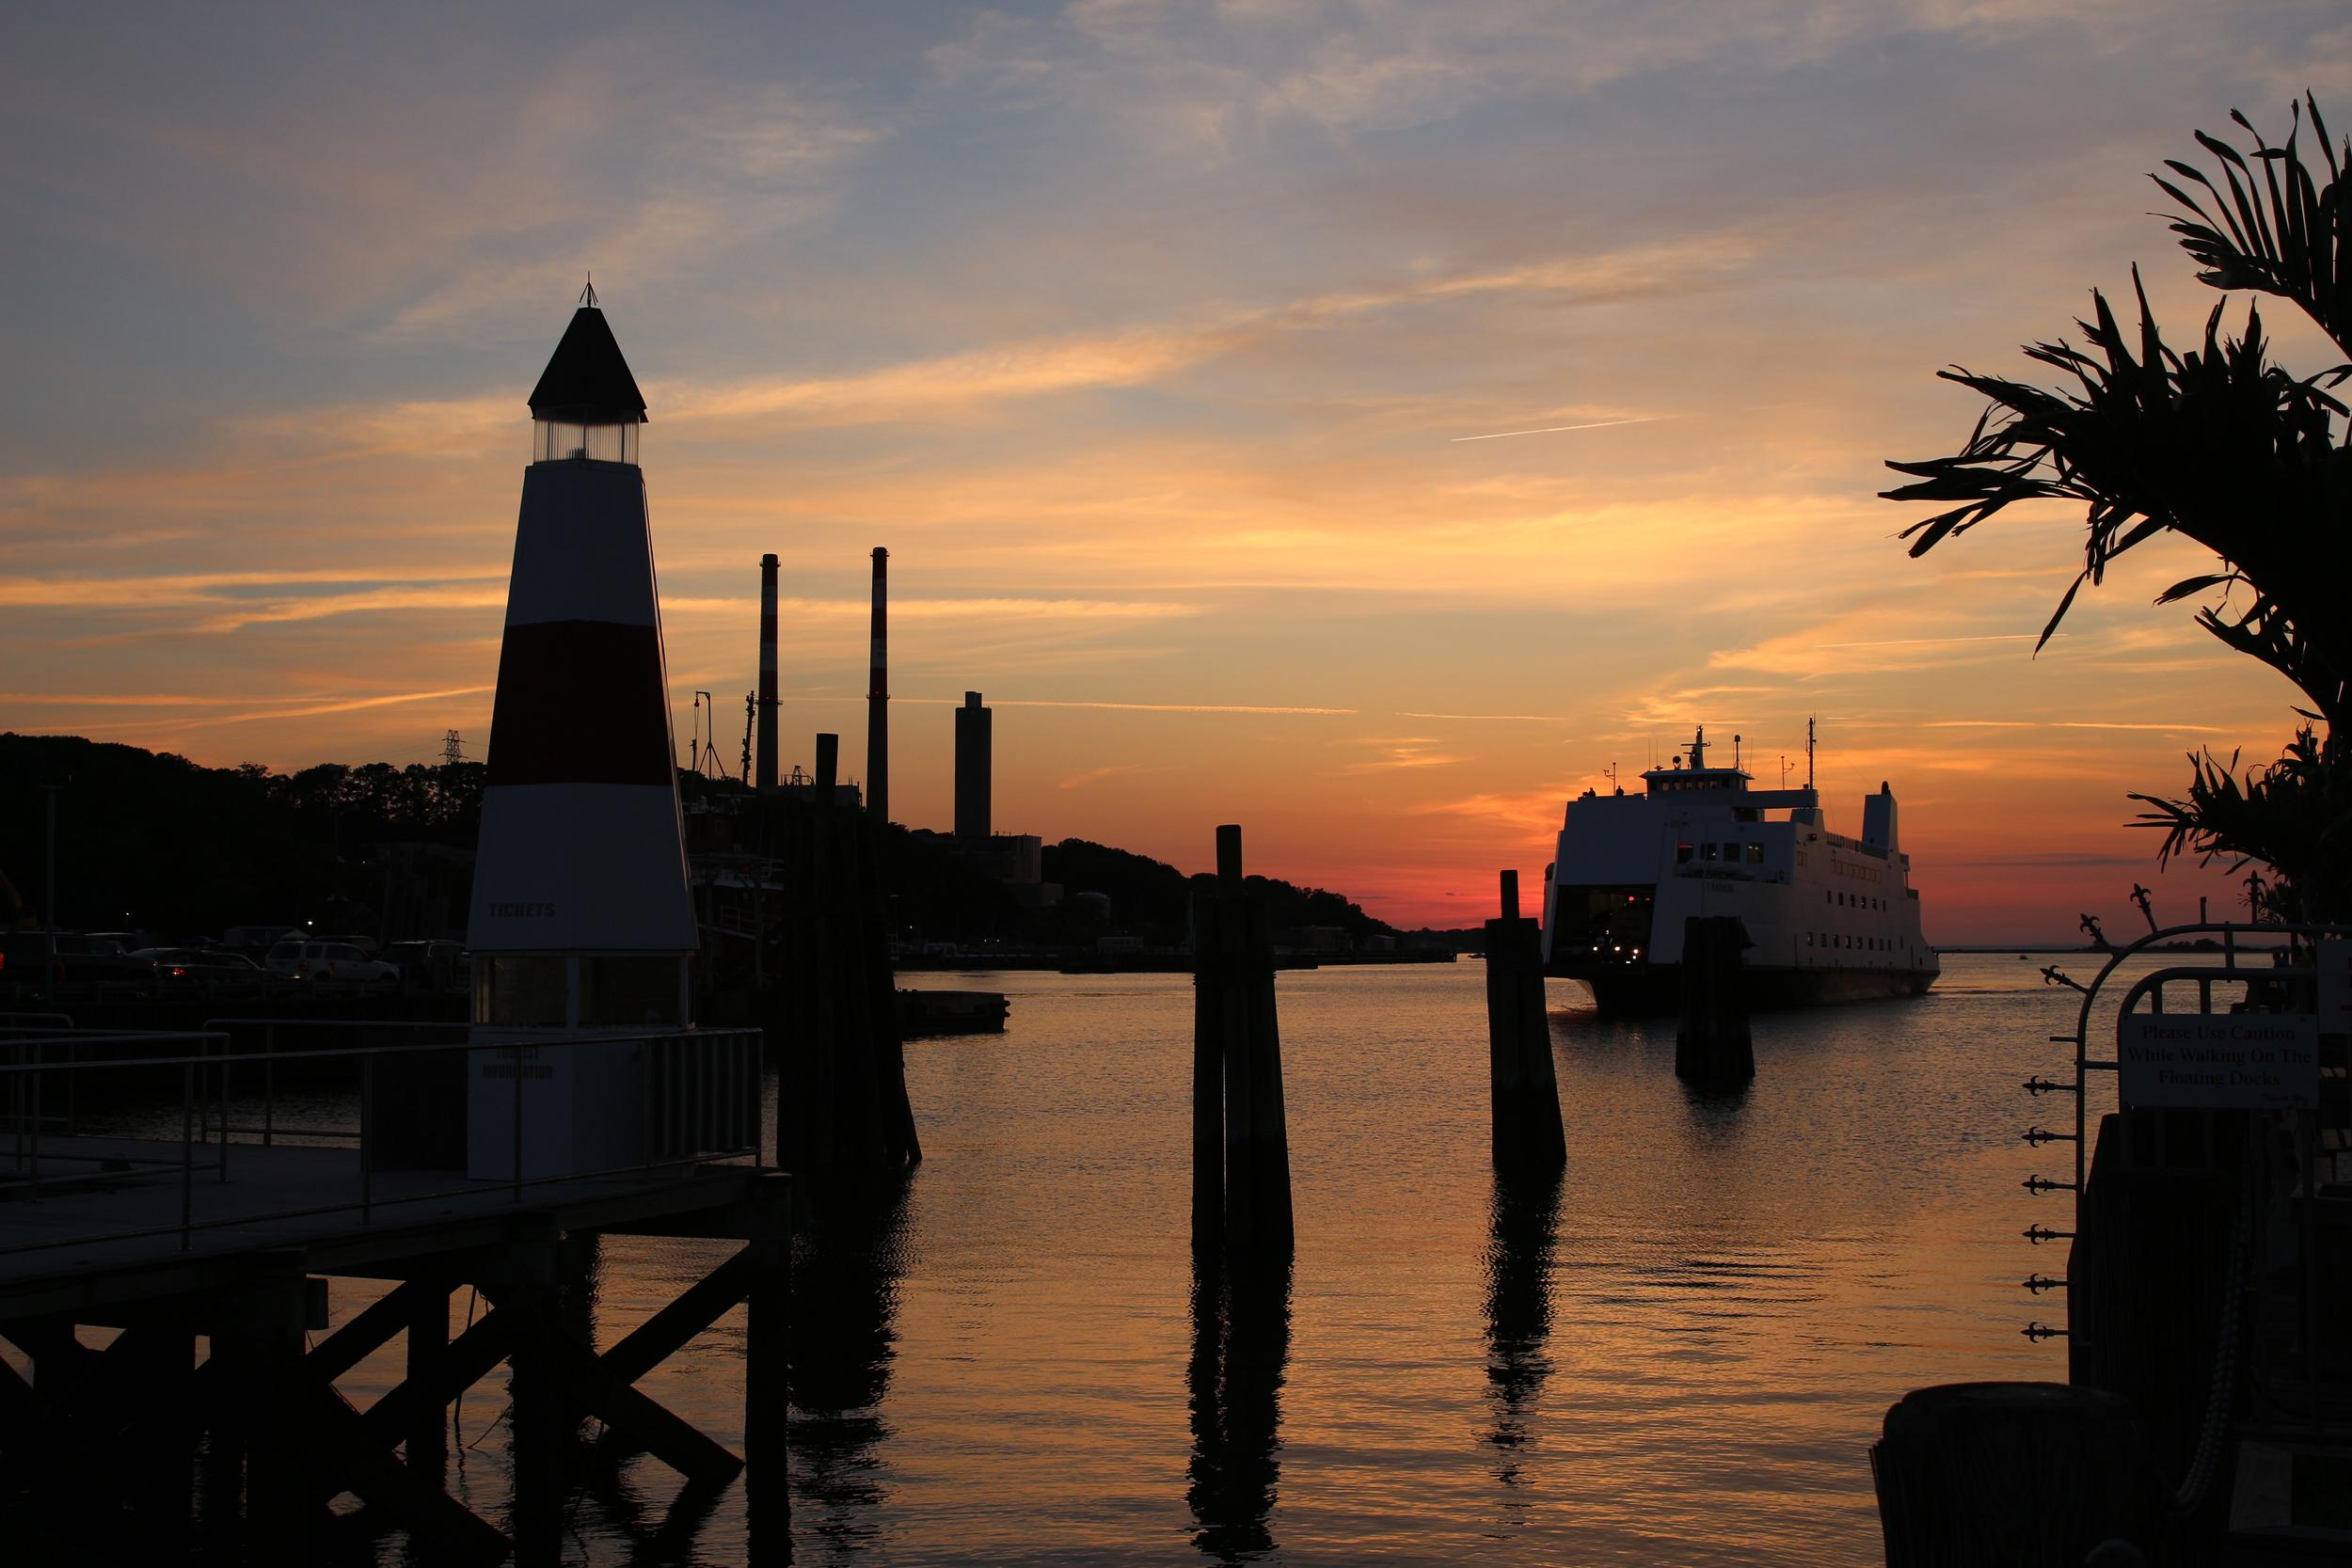 The Bridgeport - Port Jefferson ferry arriving from Connecticut.